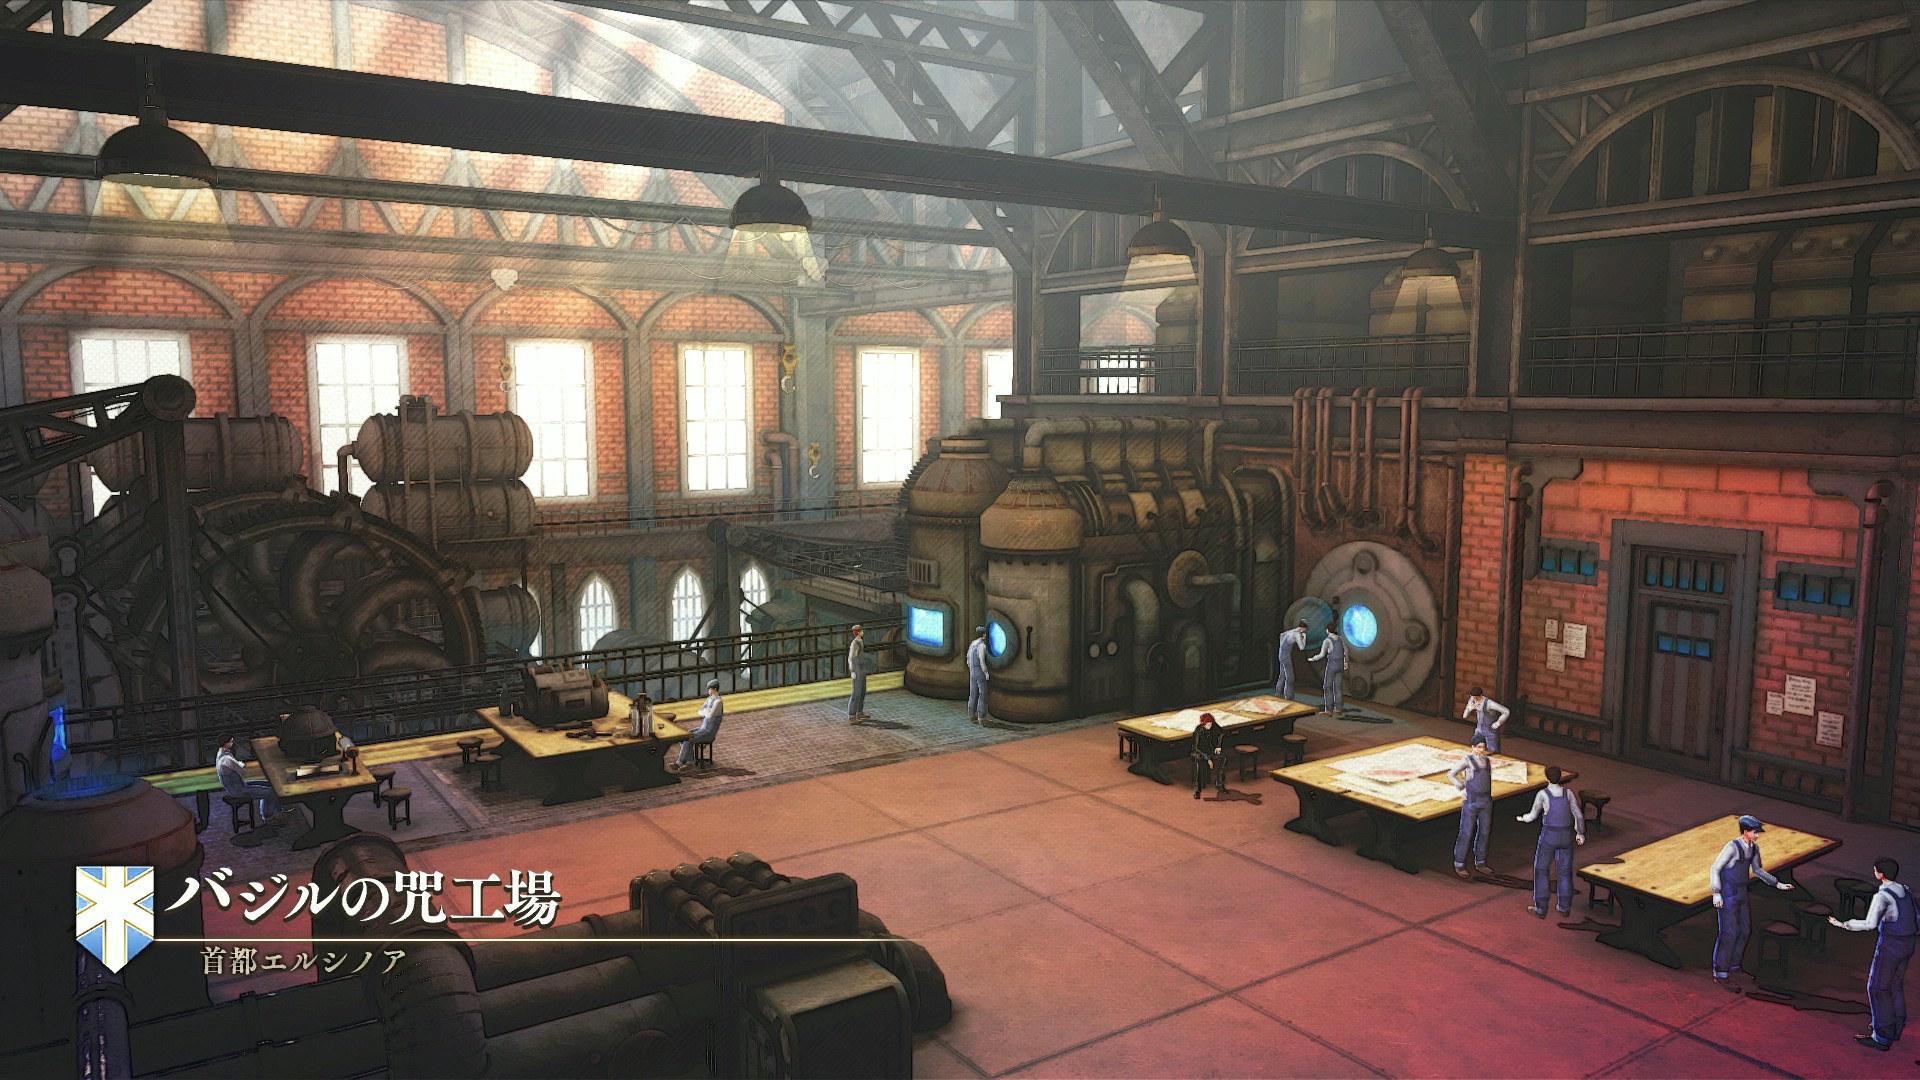 valkyria-azure-revolution-screenshot-06